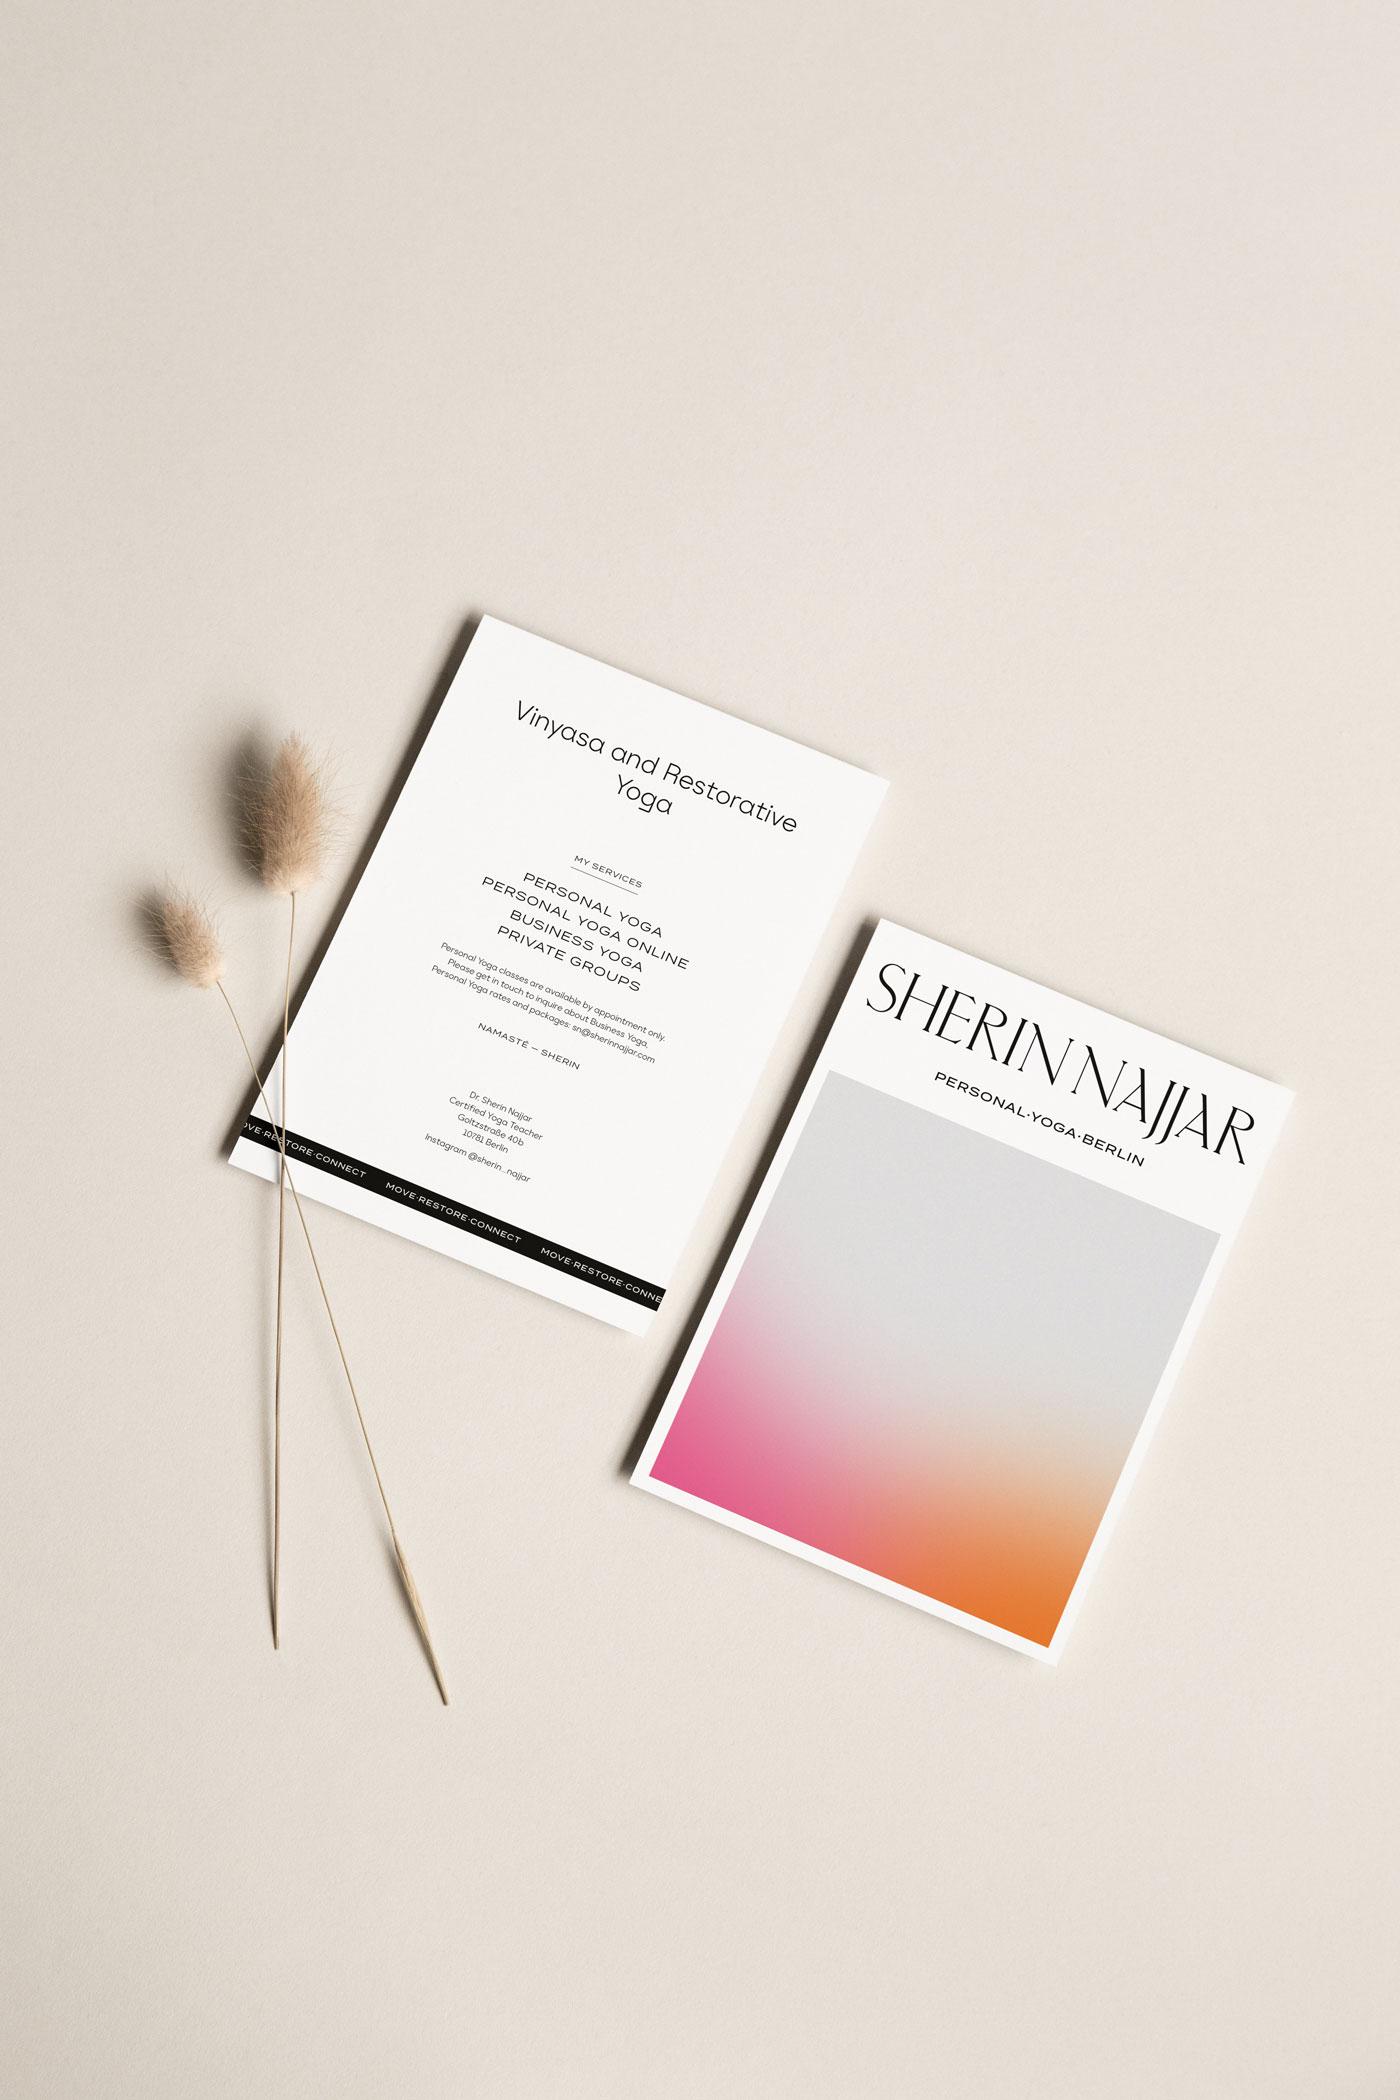 Sherin Najjar Personal Yoga – Yogalehrerin Berlin – Flyer Design by Mindt